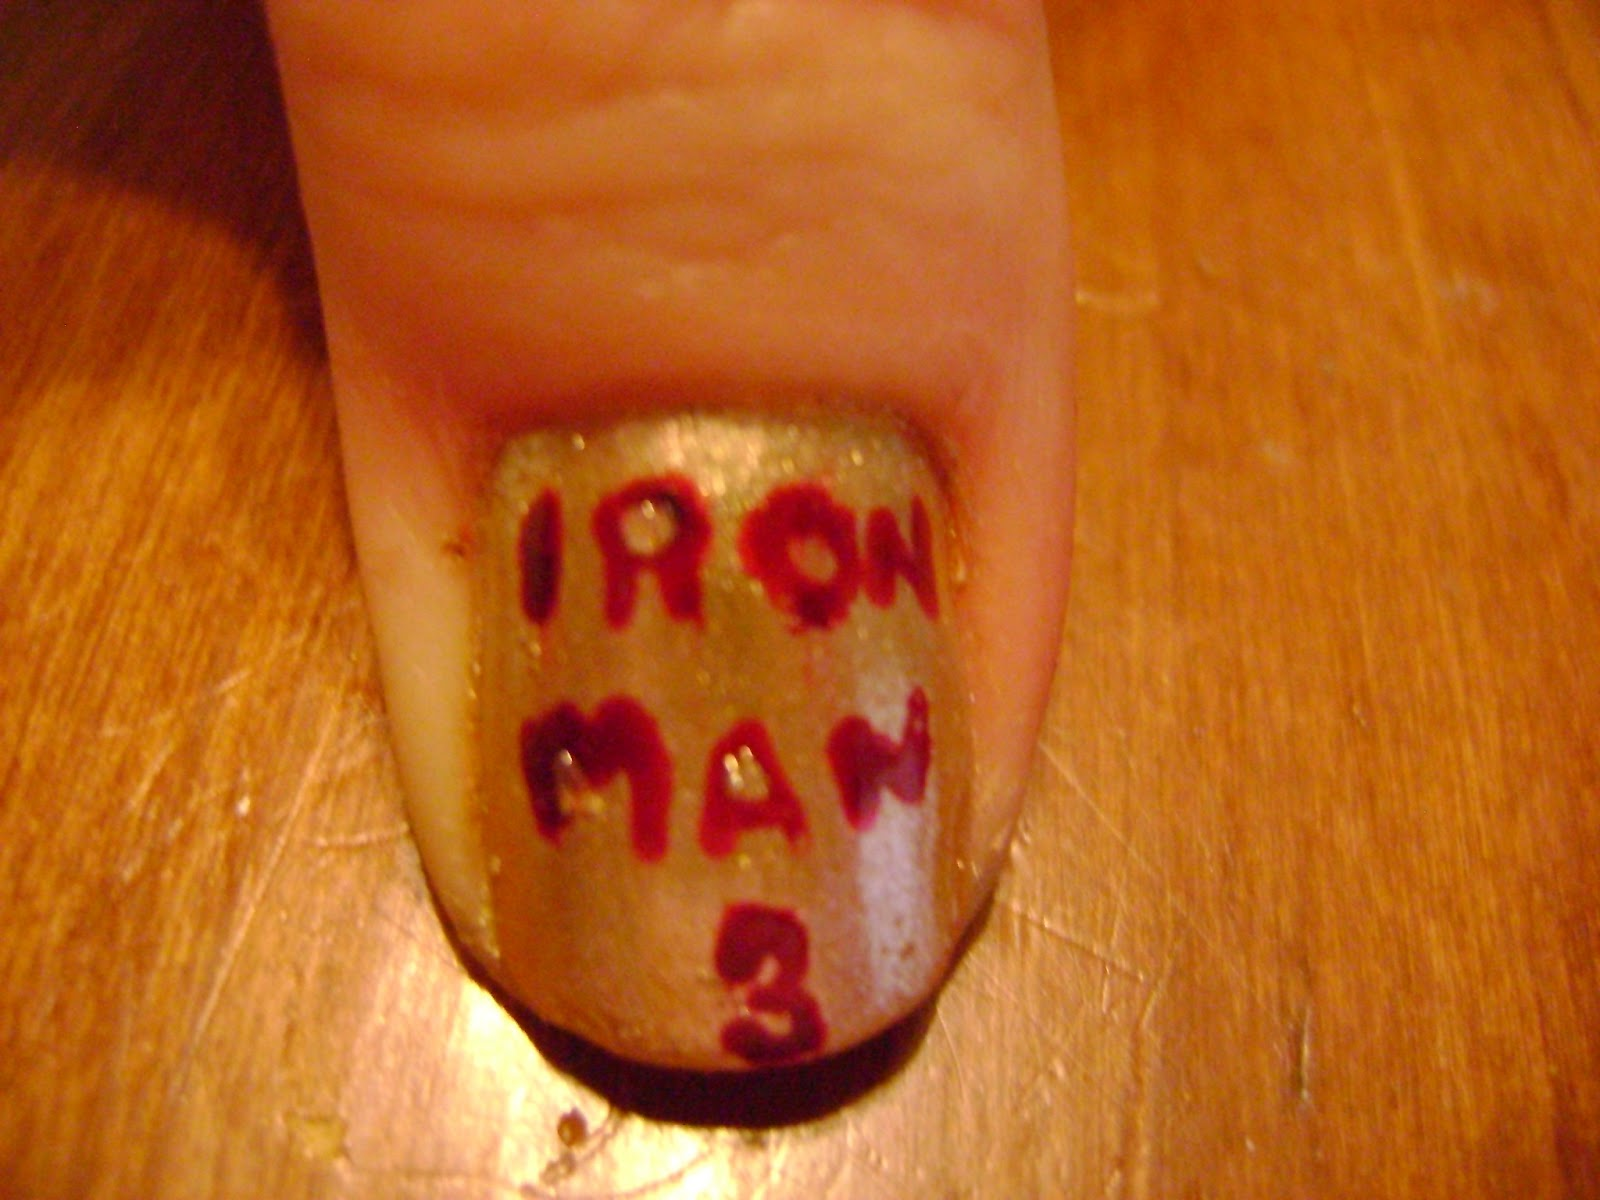 My Nail Art Hobby: Iron Man 3